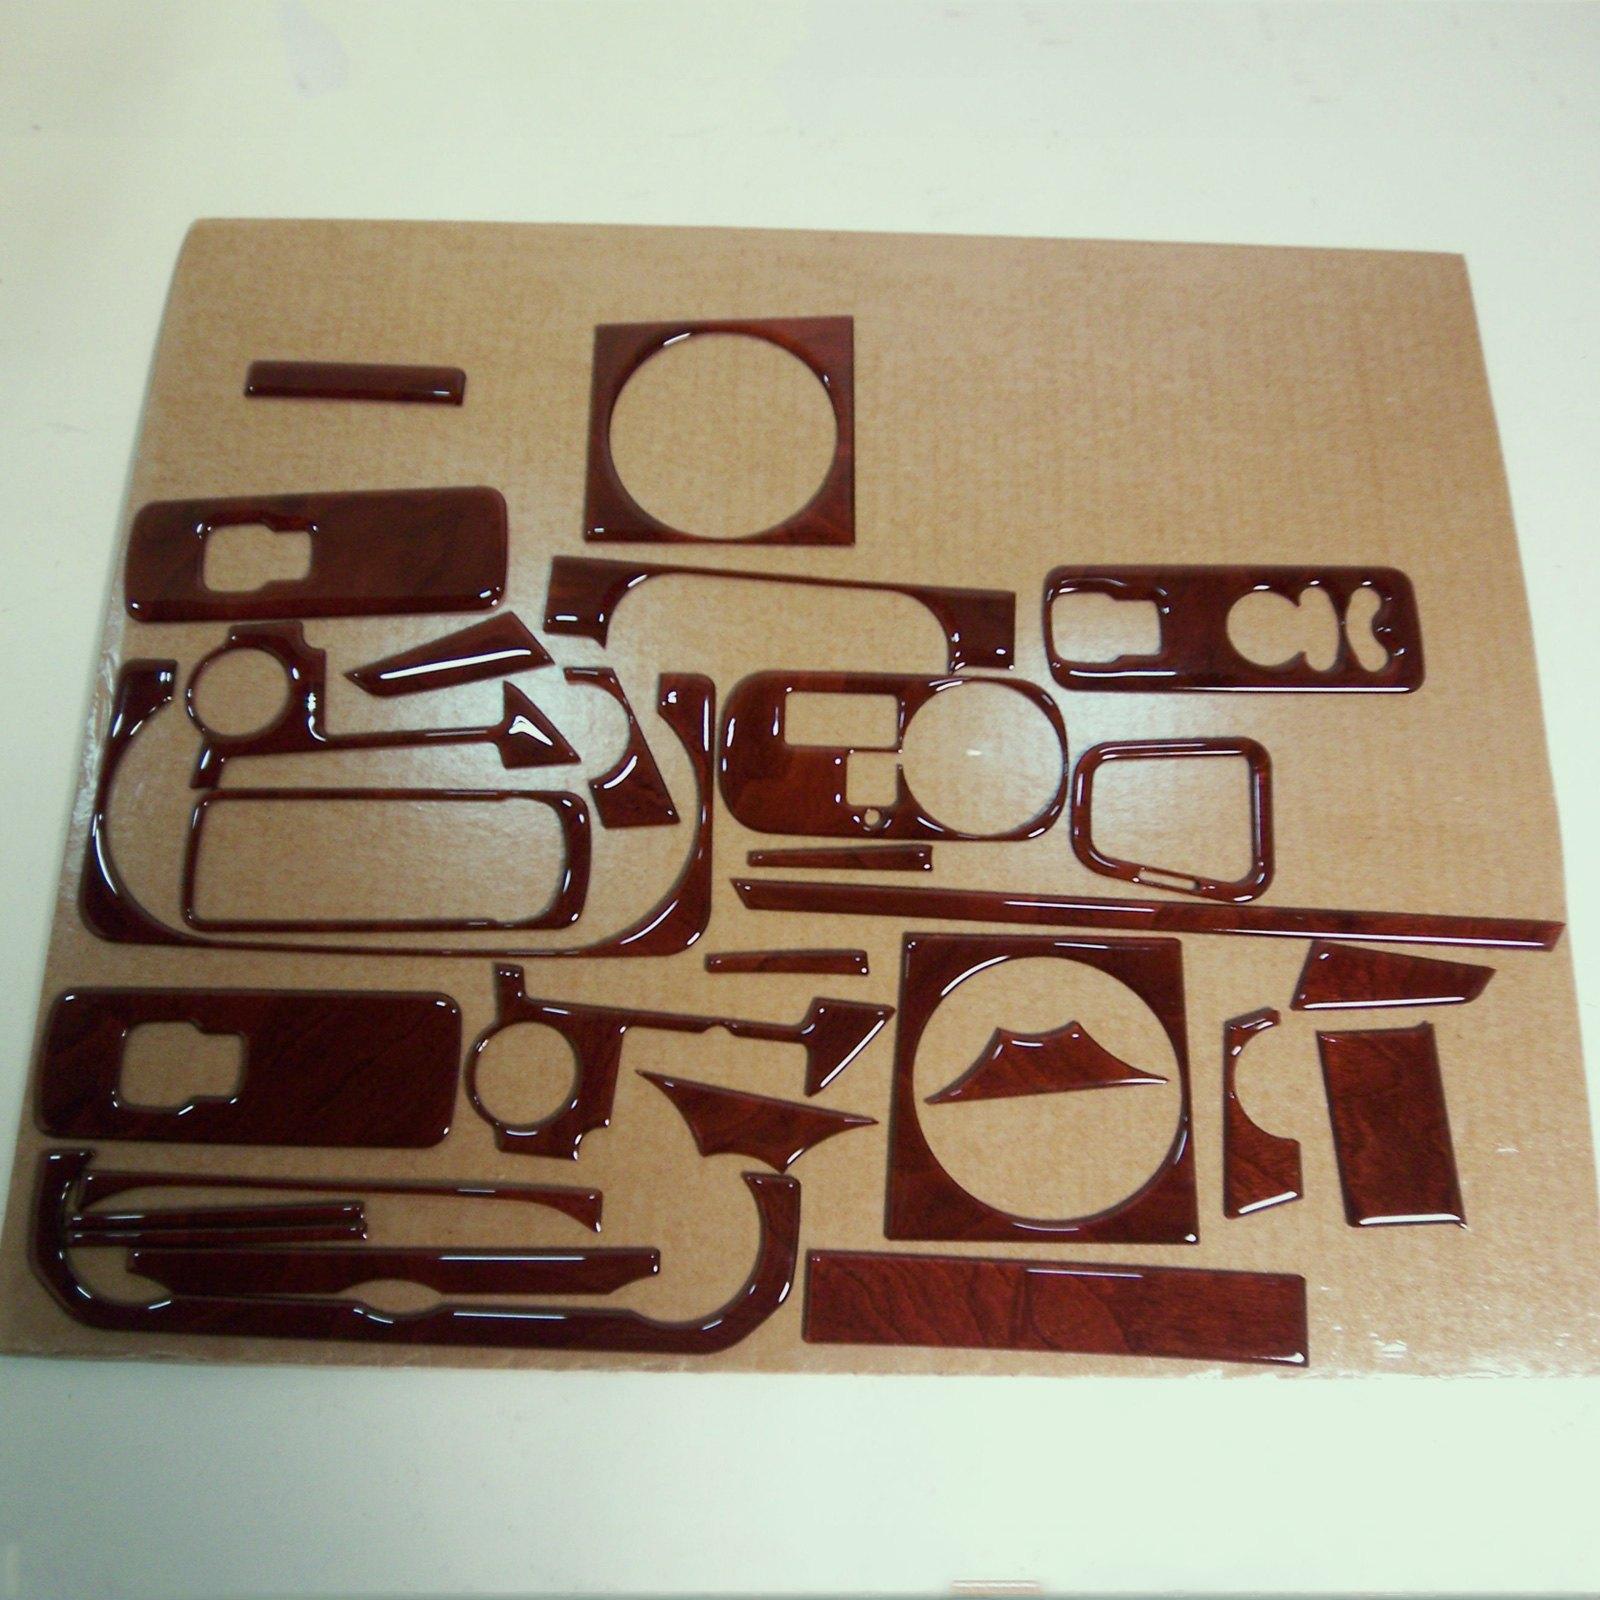 Remin exterior materials - Remin Exterior Materials 6